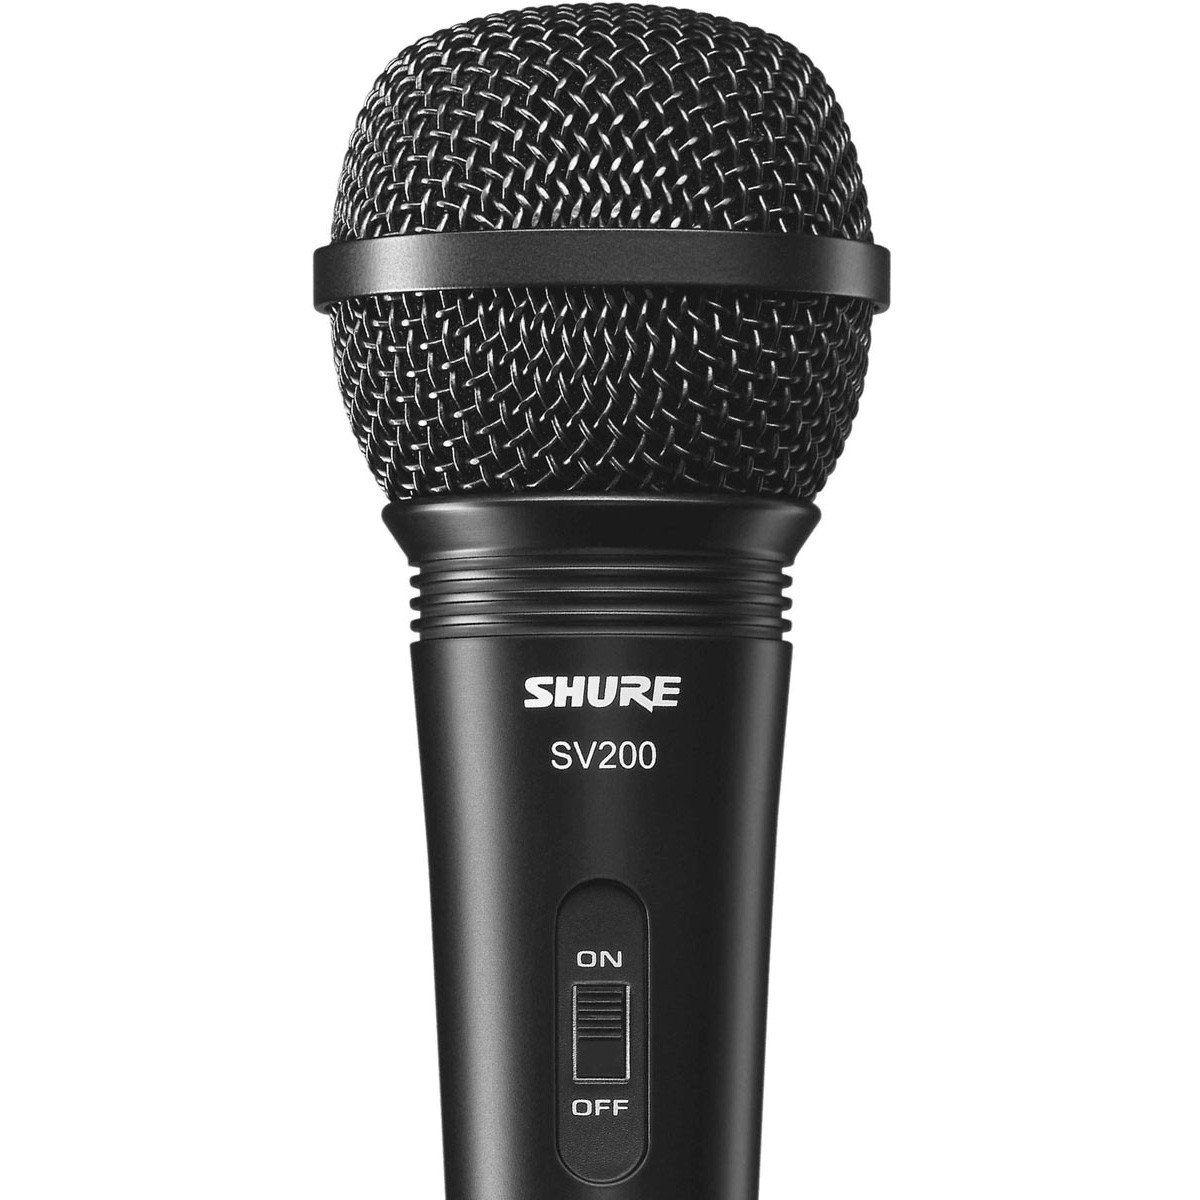 Shure SV200 Microfone Dinâmico Cardioide Shure-SV200 para Vocais e Karaokê